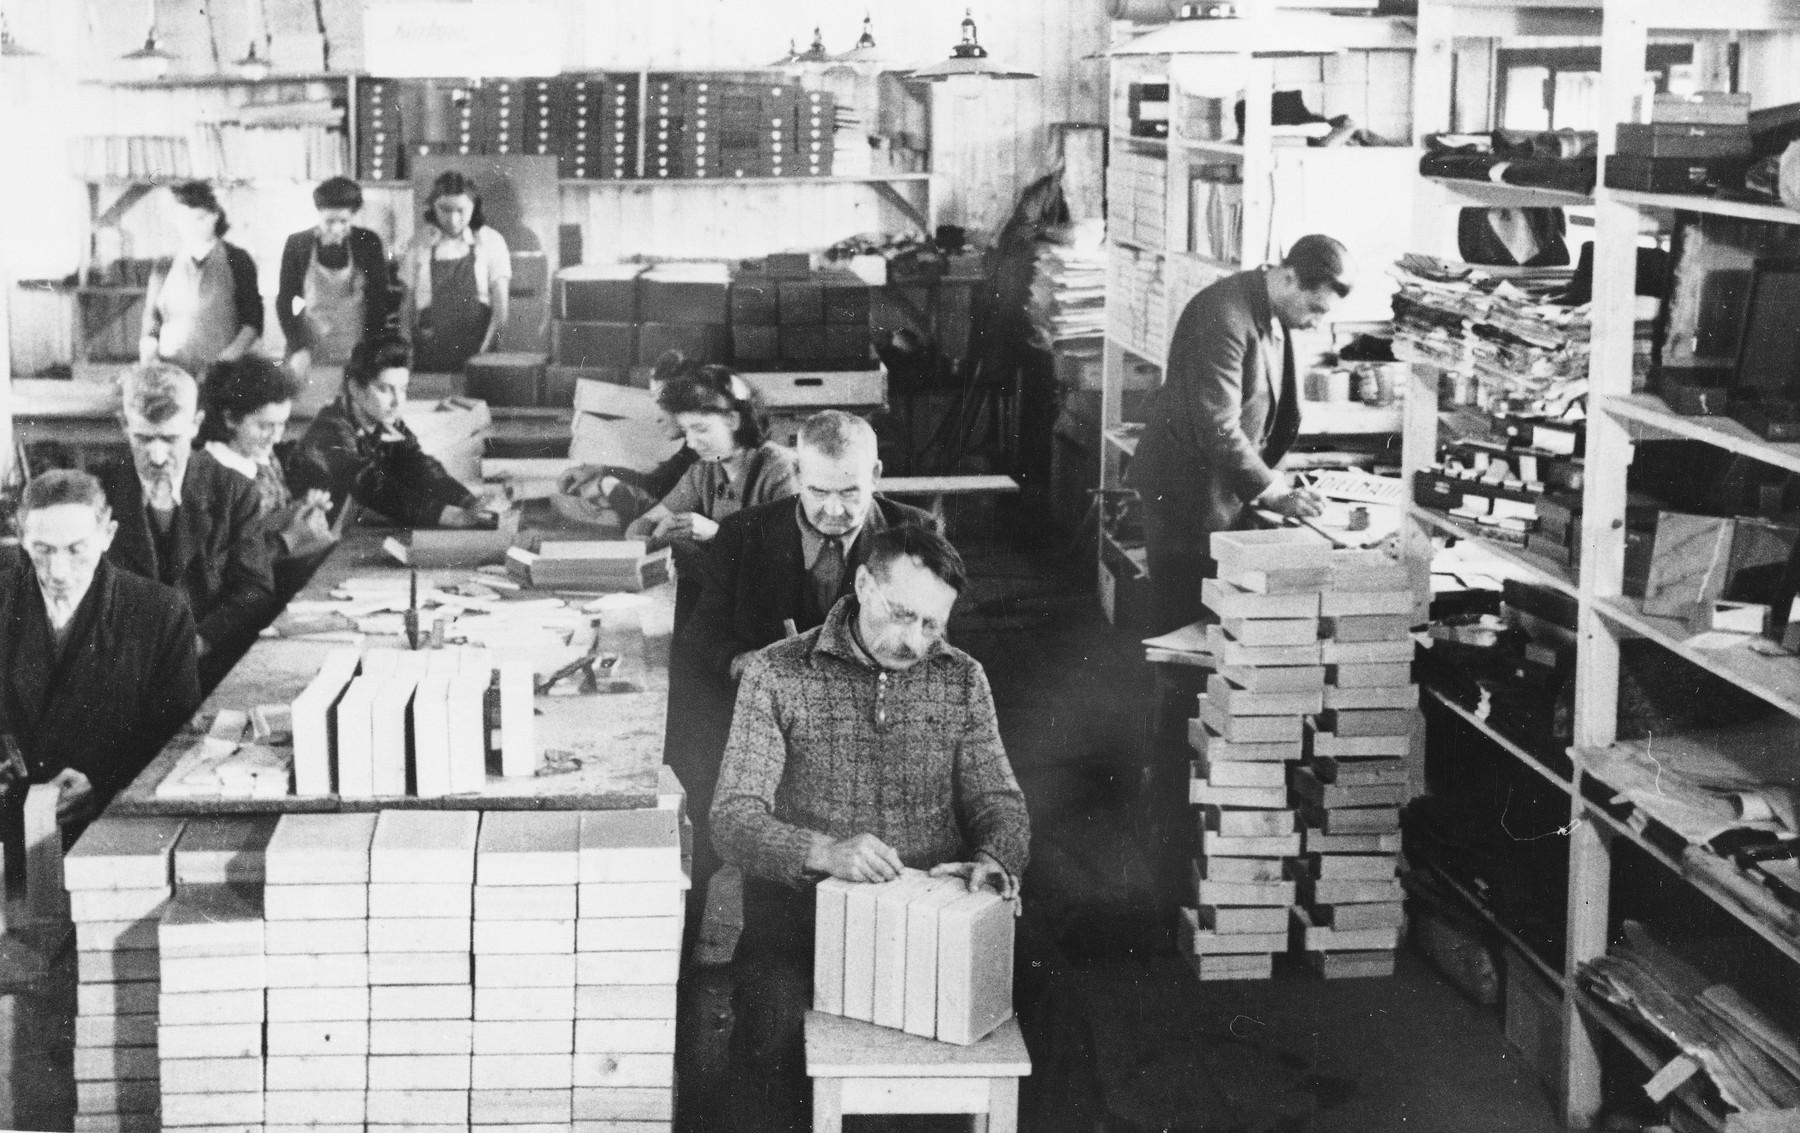 Prisoners make boxes at a Slovak labor camp.